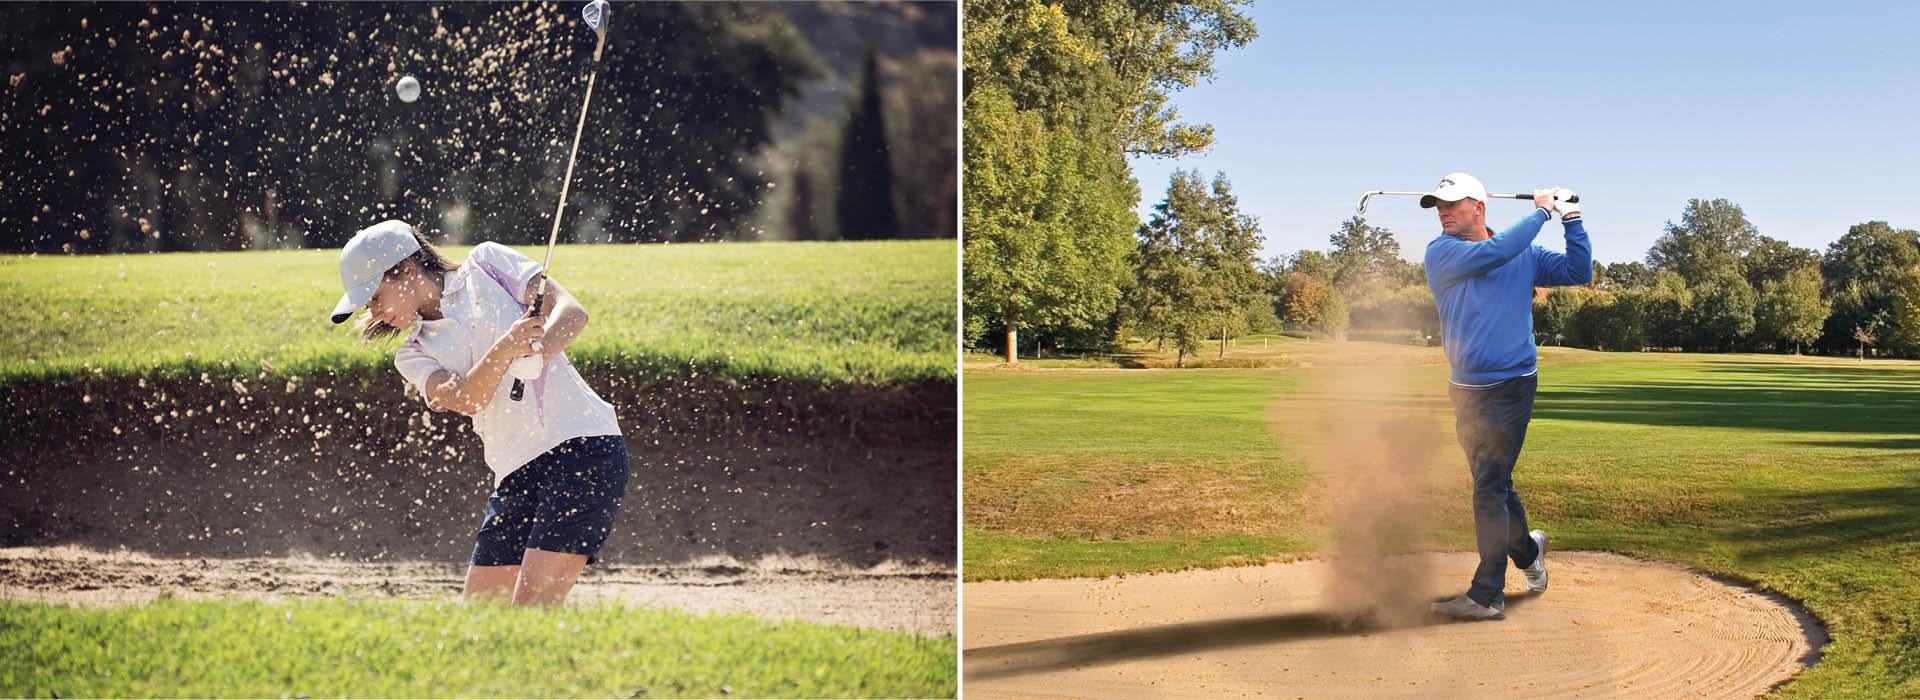 https://golfclub-peckeloh.de/wp-content/uploads/2021/02/GOPE21-073_Header_1920_x_700px4.jpg